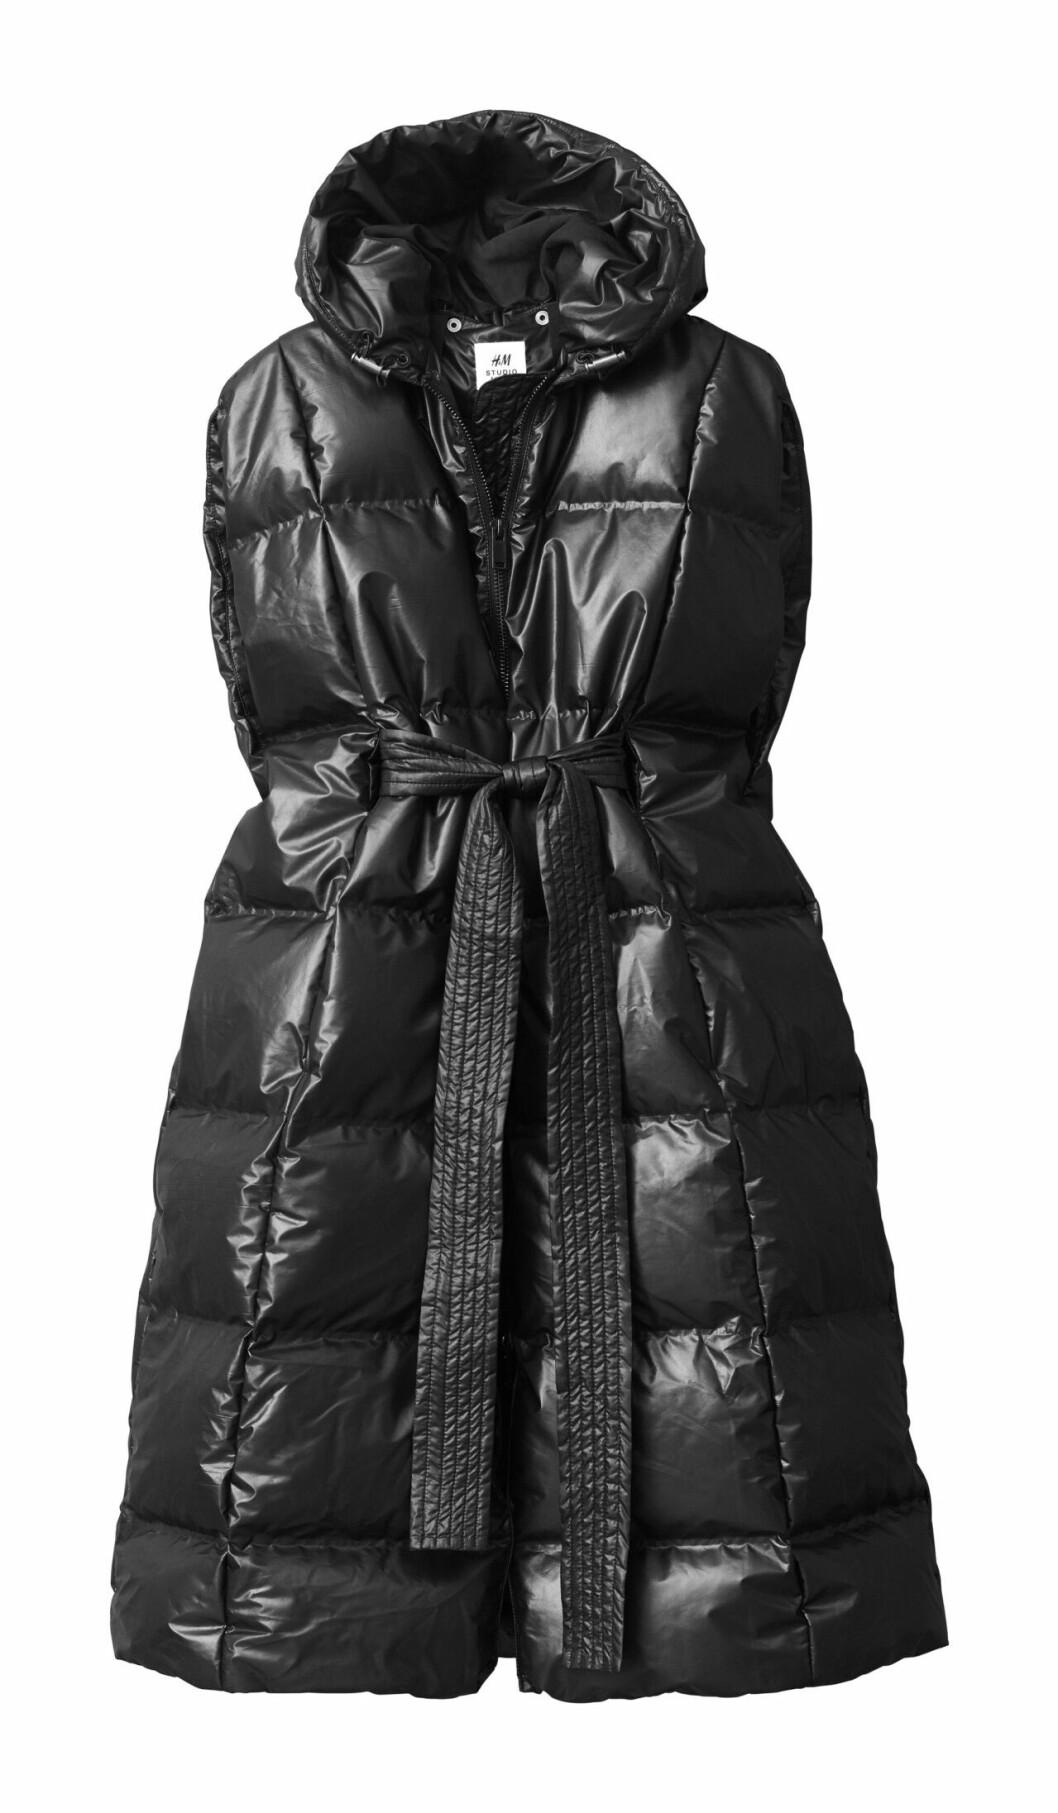 H&M Studio höstkollektion aw 2019 – svart dunväst